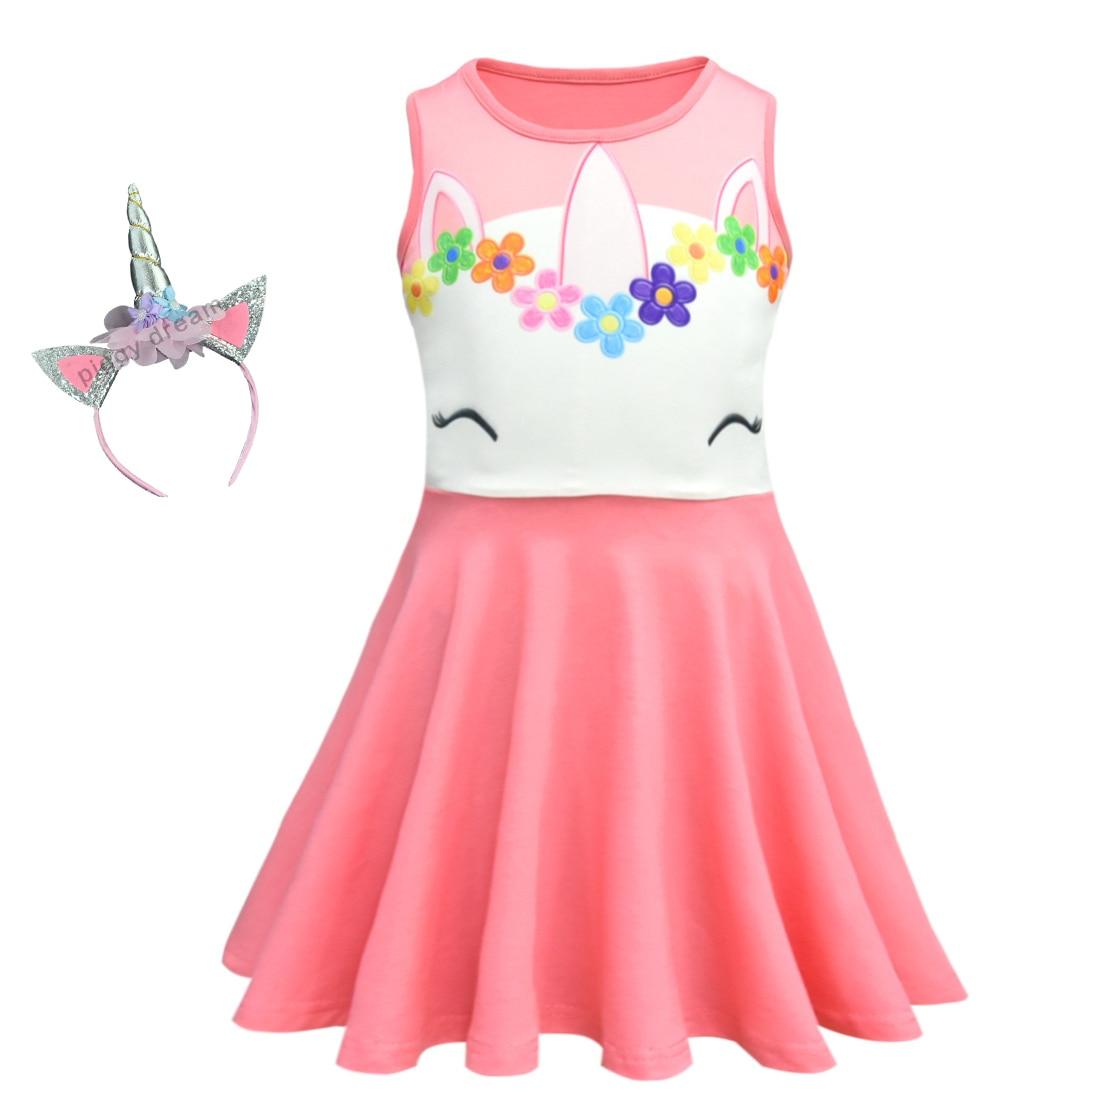 86aae0bdc1b3 Kids Dresses for Girls Unicorn Dress Costume Birthday Party Dress 2019  Girls Dress Summer Princess Children Clothes Vestidos-in Dresses from  Mother & Kids ...